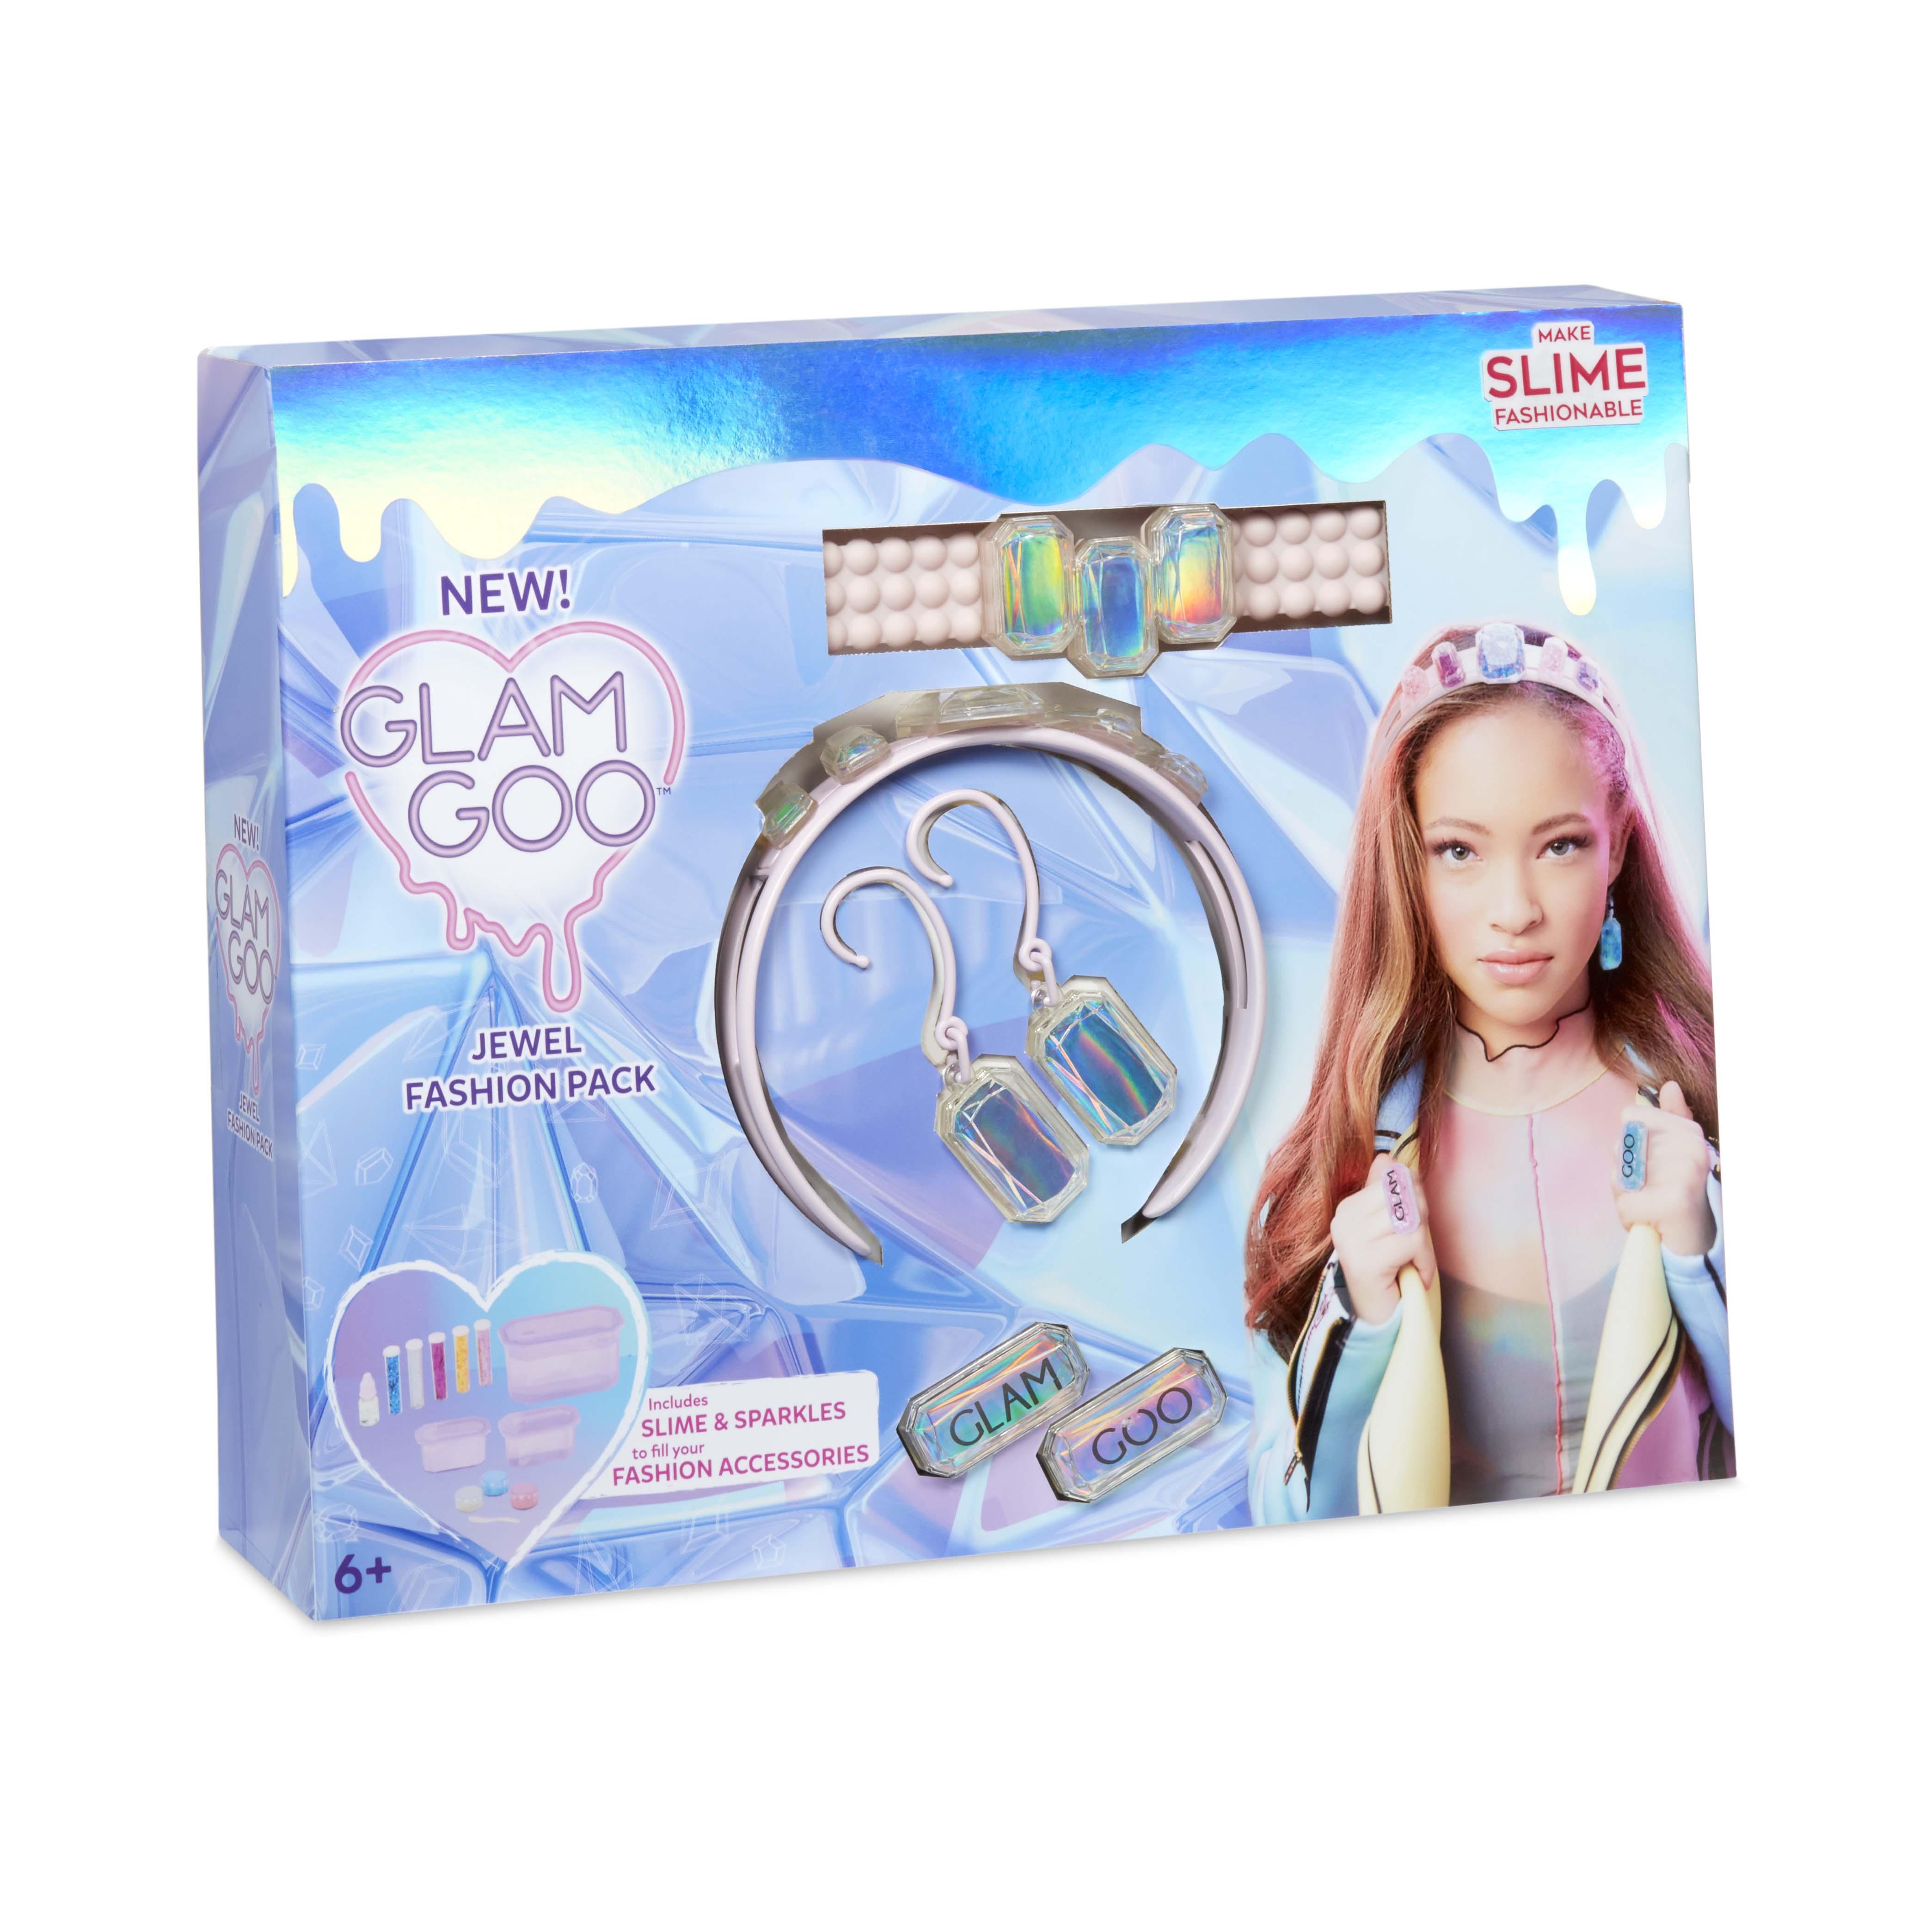 Afbeelding van Glam Goo Jewel Fashion Pack